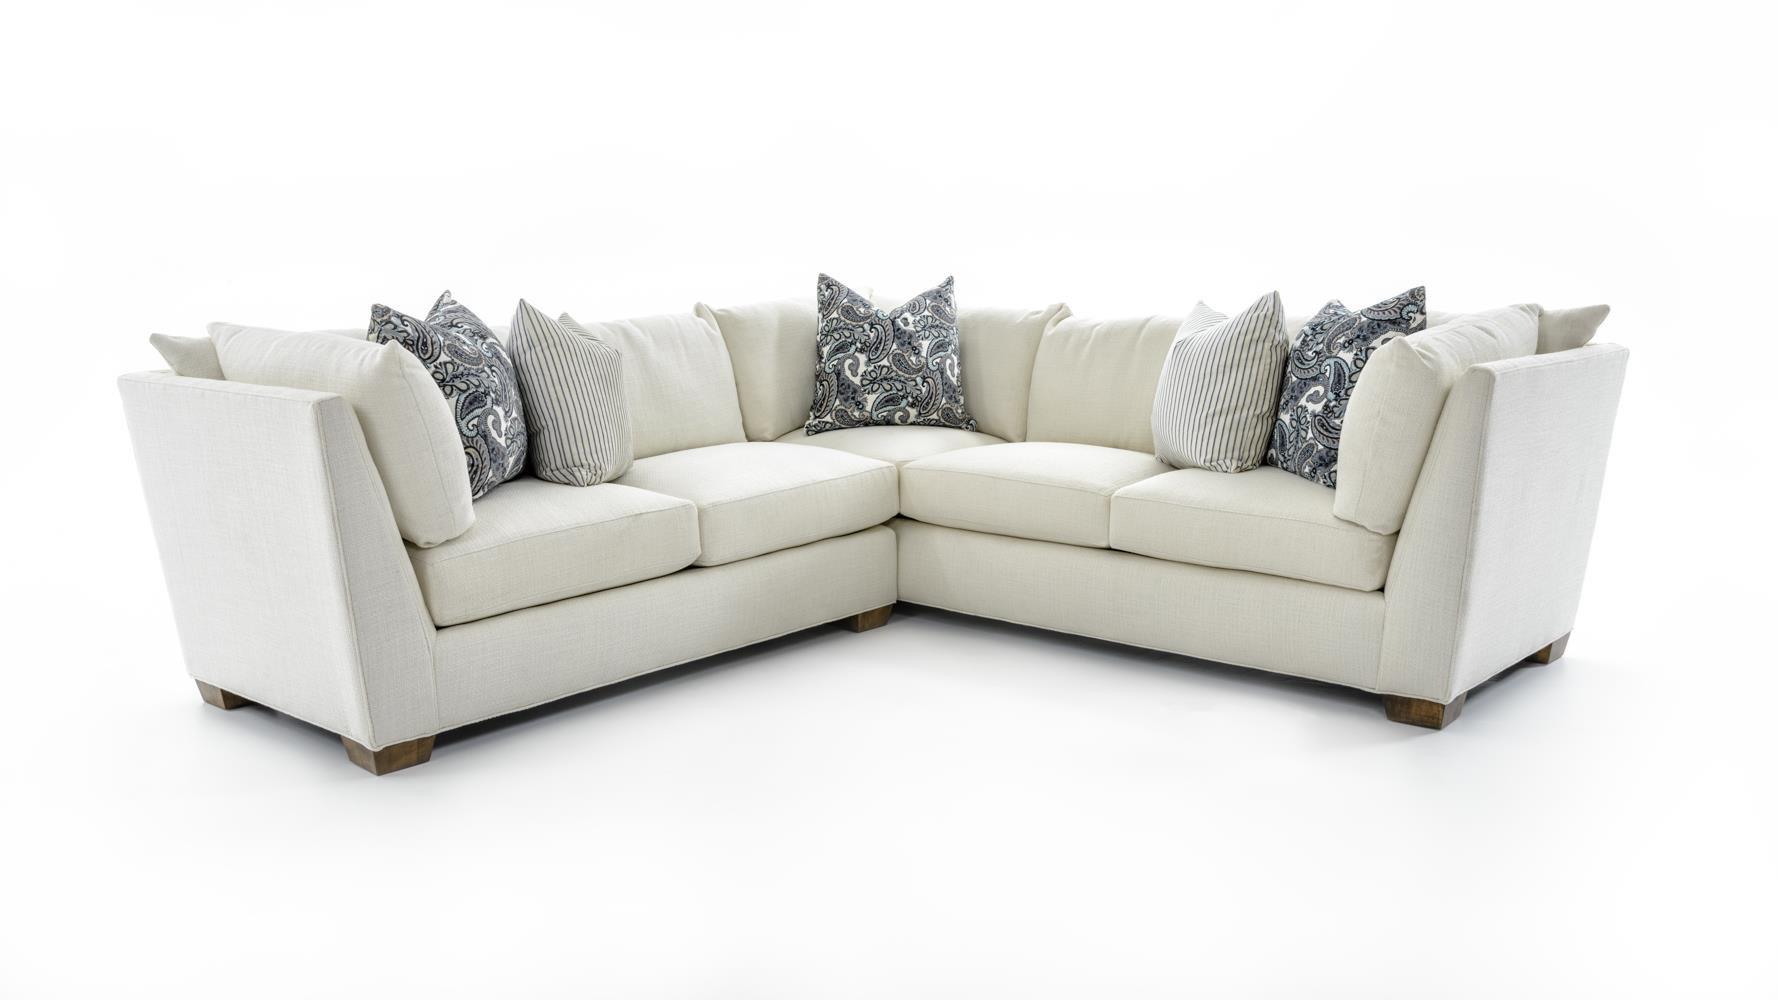 Drexel Heritage® Burton 2 Pc Corner Sectional Sofa - Item Number: D20193 Sect